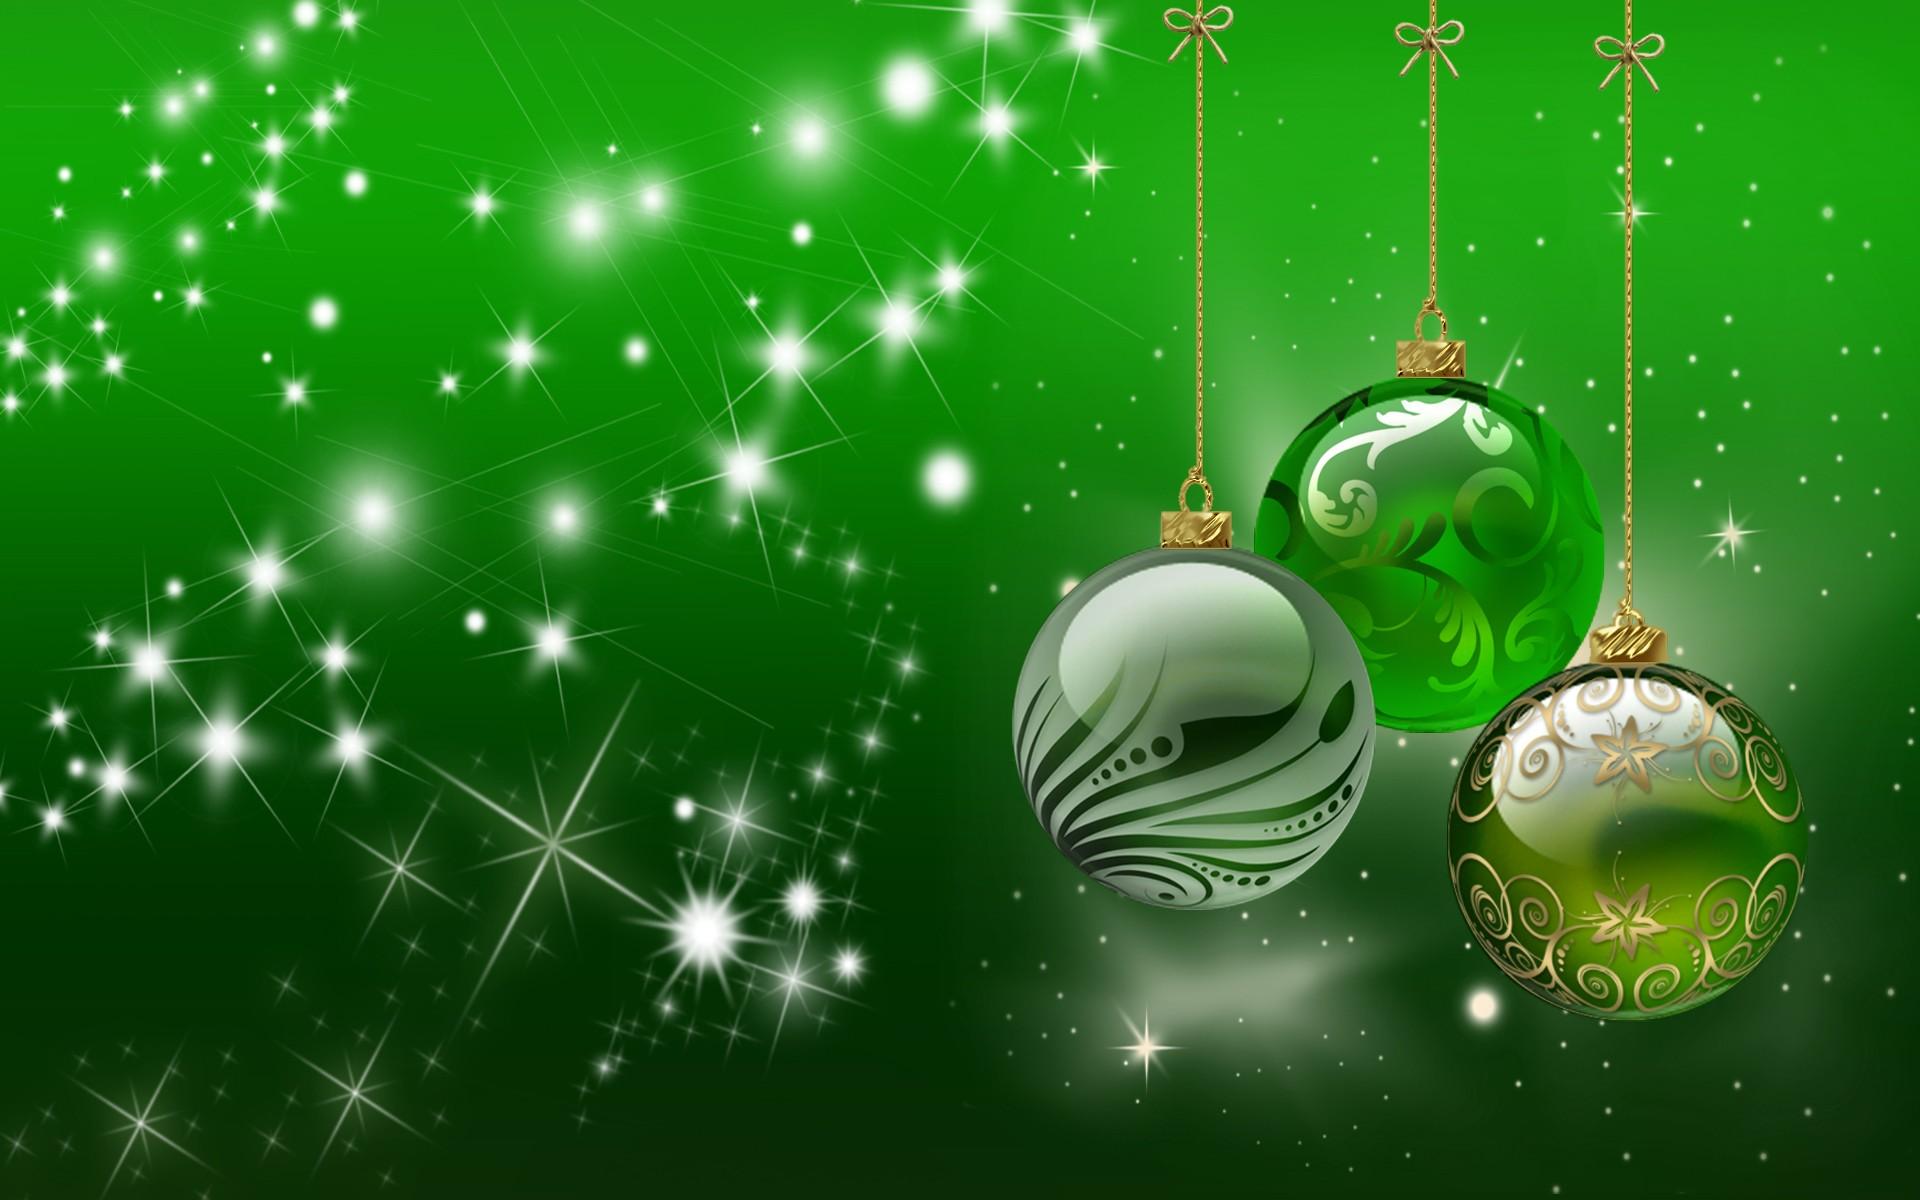 Bolas De Navidad Rojas Sobre Fondo Verde: Merry Christmas, Palestrinos